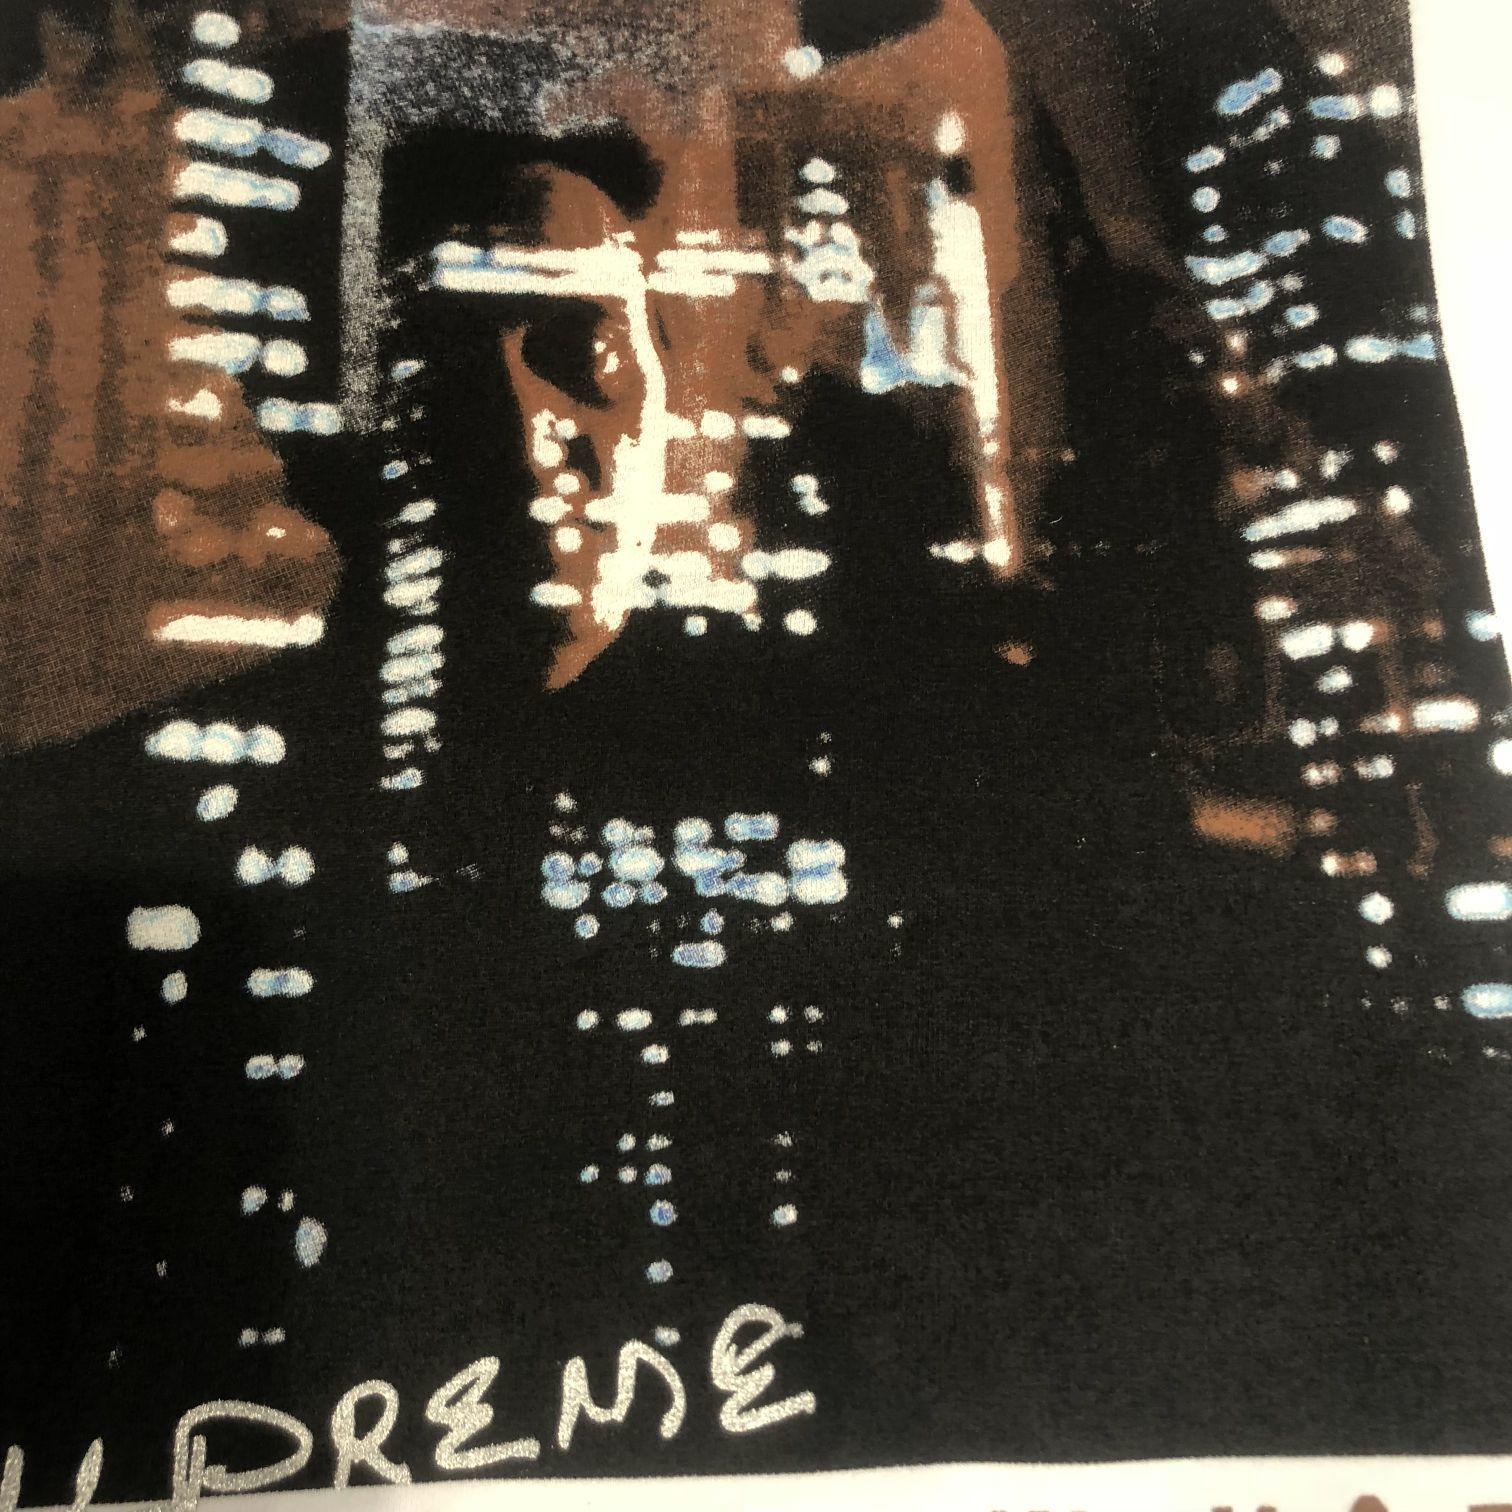 ? 180 【Supreme Christopher Walken King Of New York Tee】纽约之王短袖T恤 黑 白 S-XL ZP打样,拒绝看图做货  印花:采用环保胶浆 健康无害不污染 印花清晰不开裂手感细腻平滑 面料:精选纱线定织定染,圆筒230克精梳棉 手感柔软透气